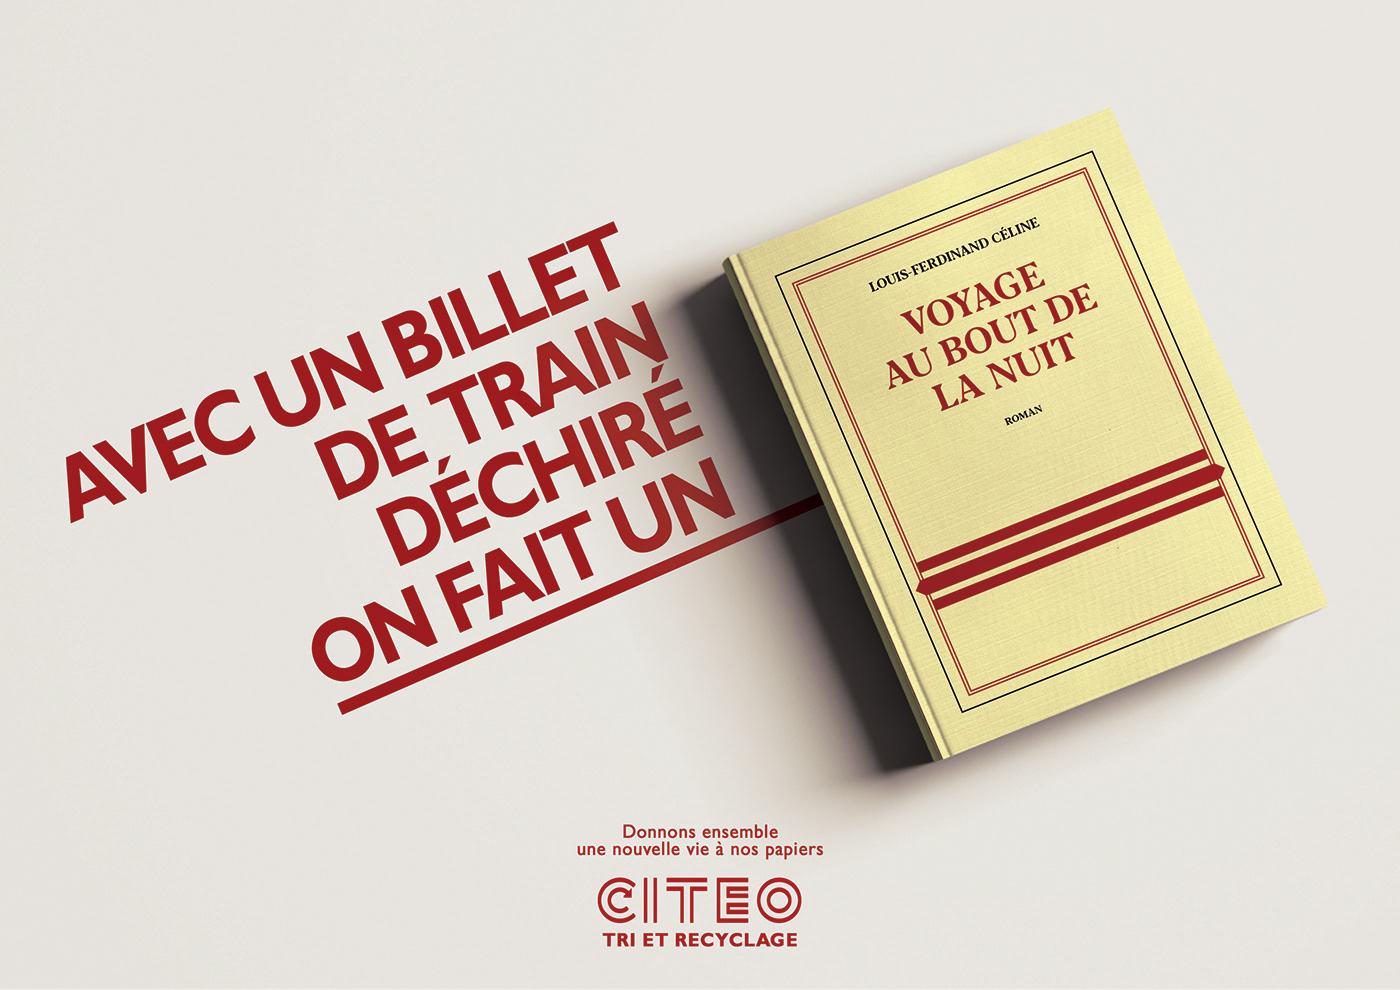 Citeo livre book ad recyclage recycler ecologie tri papier paper